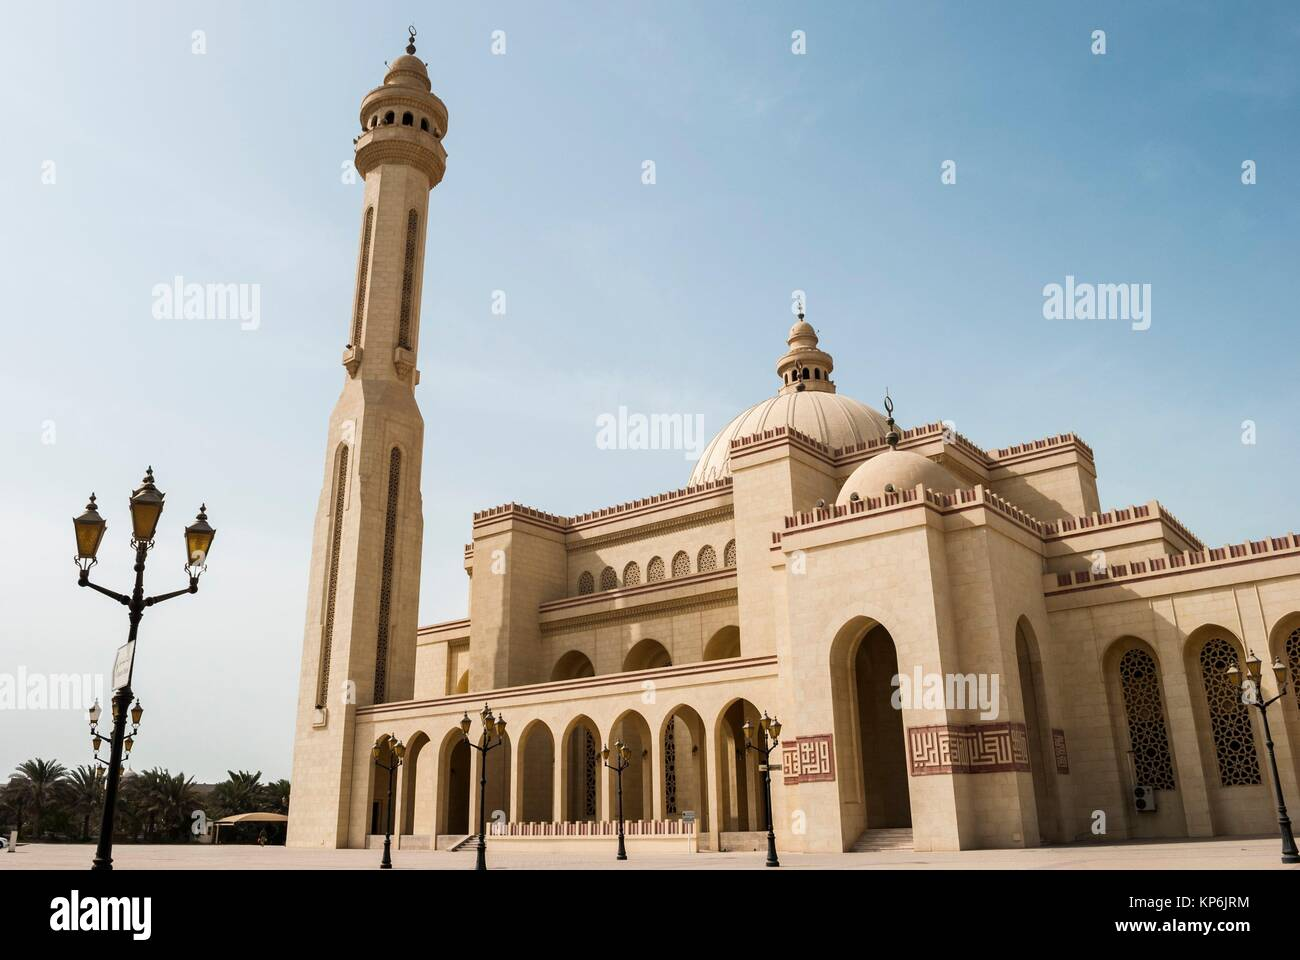 Al Fateh Grande Moschea, Manama, Bahrein, Emirati Arabi Uniti. Immagini Stock